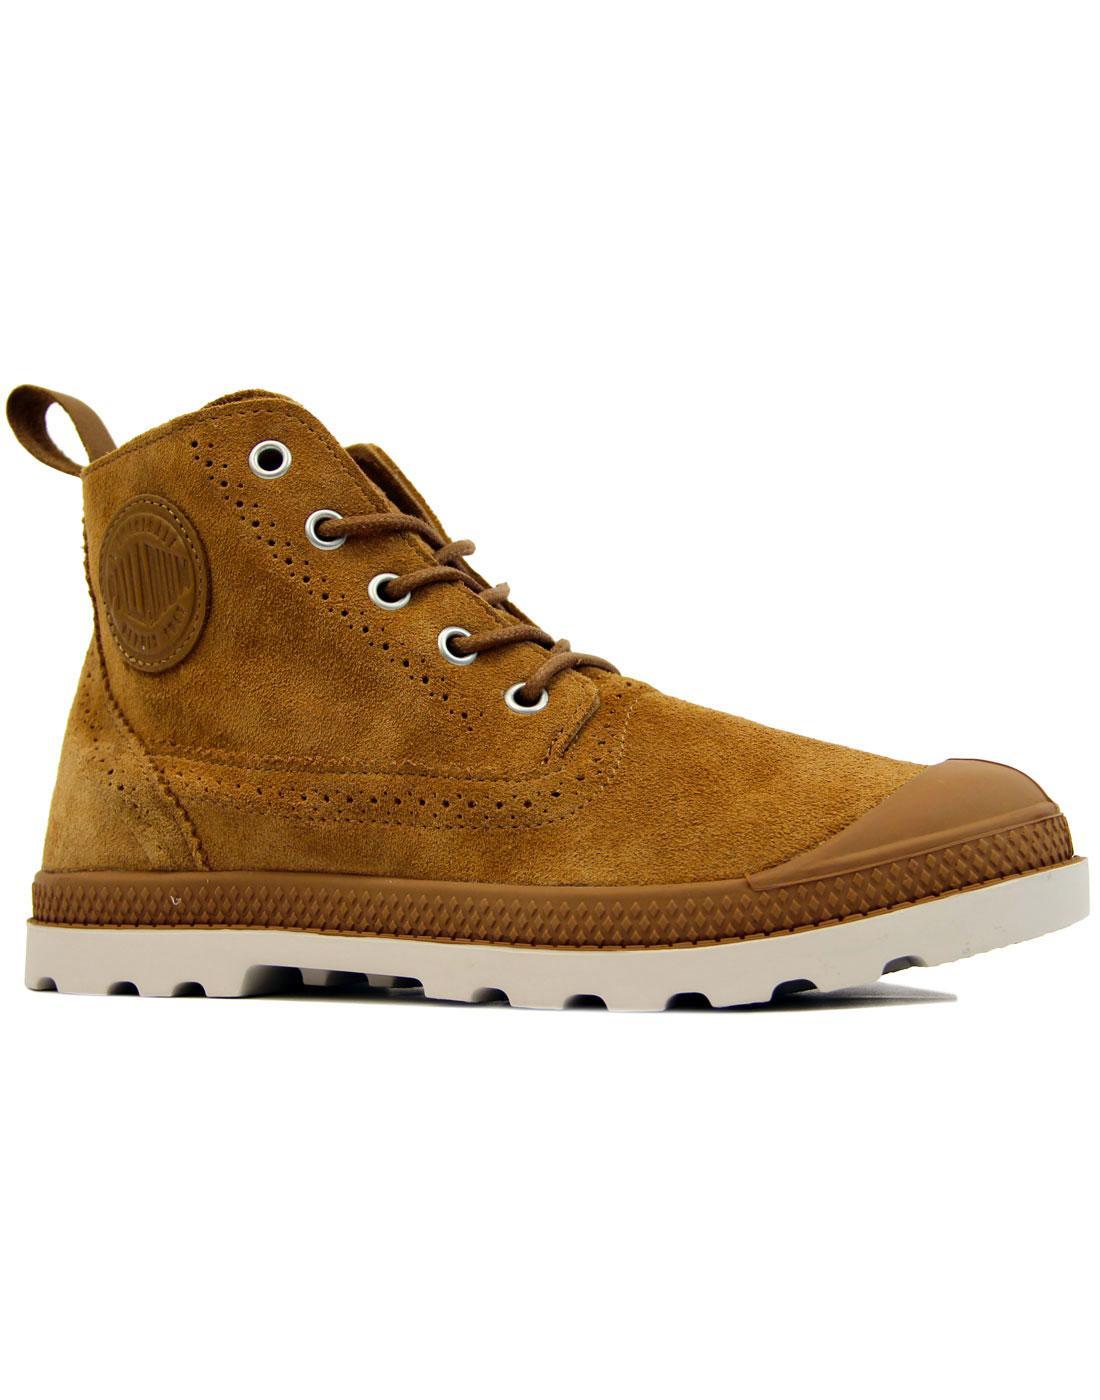 Pampa London PALLADIUM Retro Mid Suede Boots (BS)